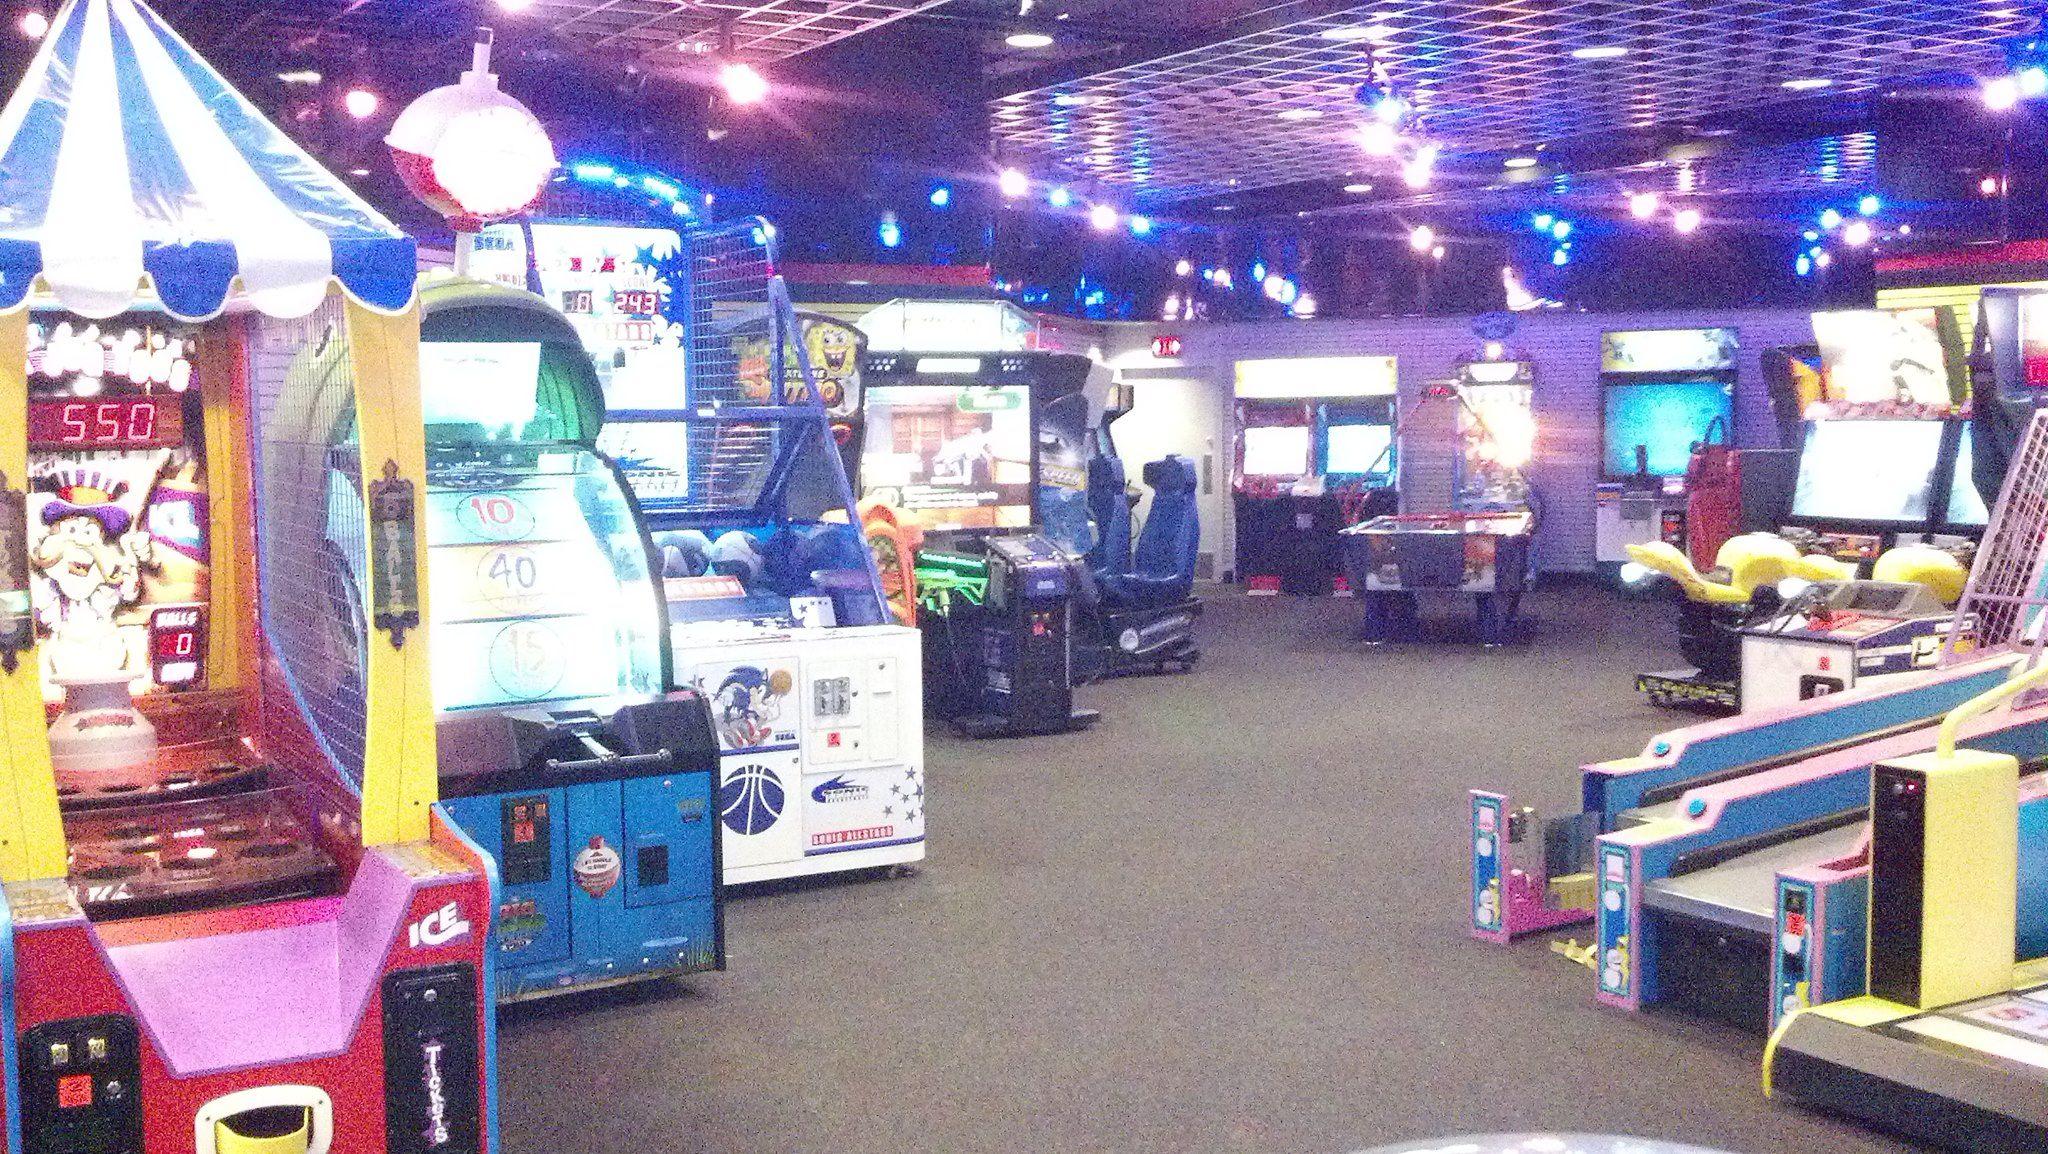 Fun N Games Arcade 540 721 5959 Arcade Located At Two Locations Chesterfield Towne Center Mall In Between Garden Ridge Smith Mountain Lake Garden Ridge Arcade